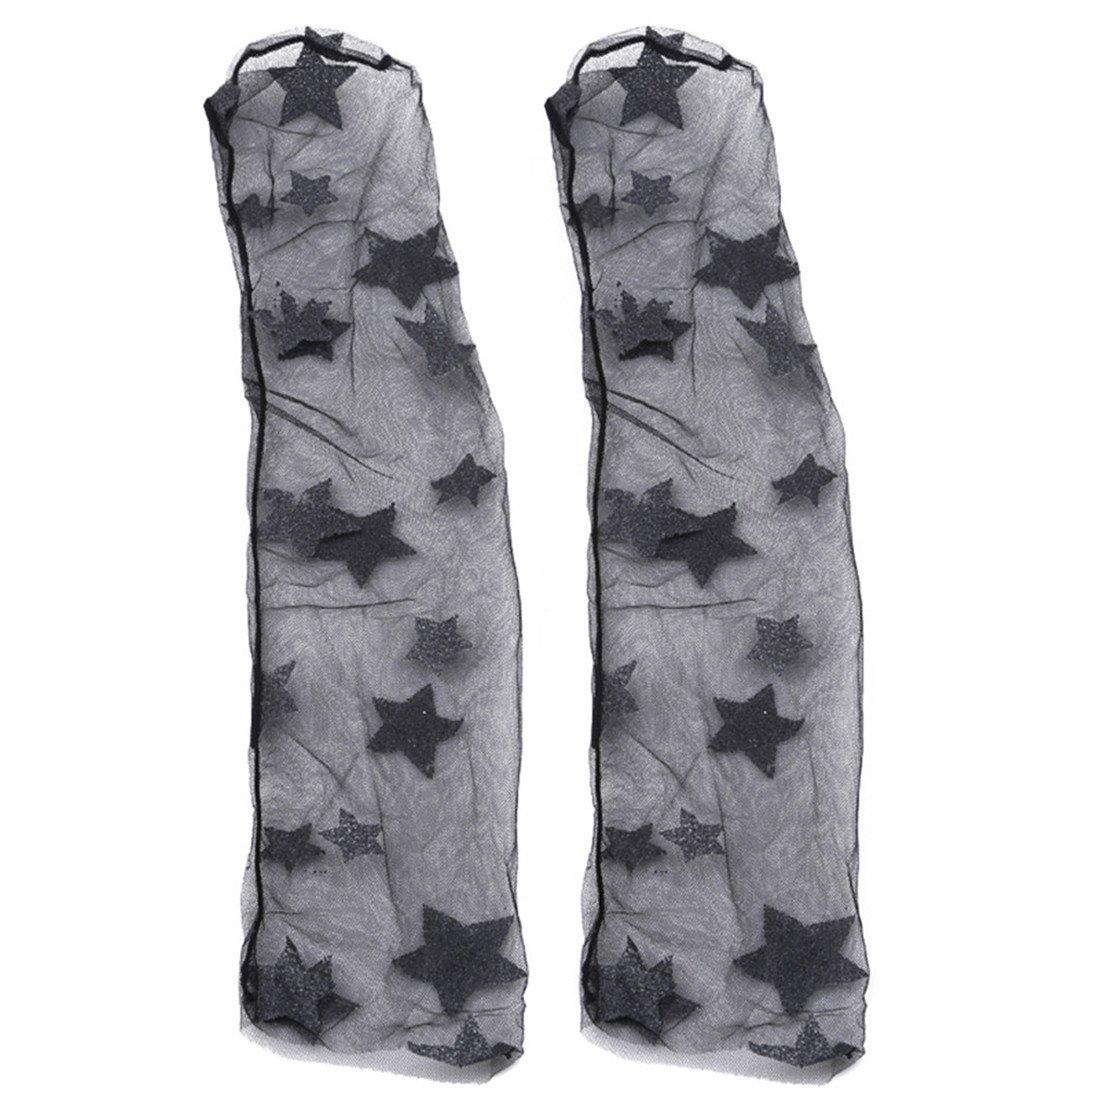 Edtoy 1 Pairs Stars pattern Women Socks Sheer Slouch Socks Transparent Lace Socks (Black)